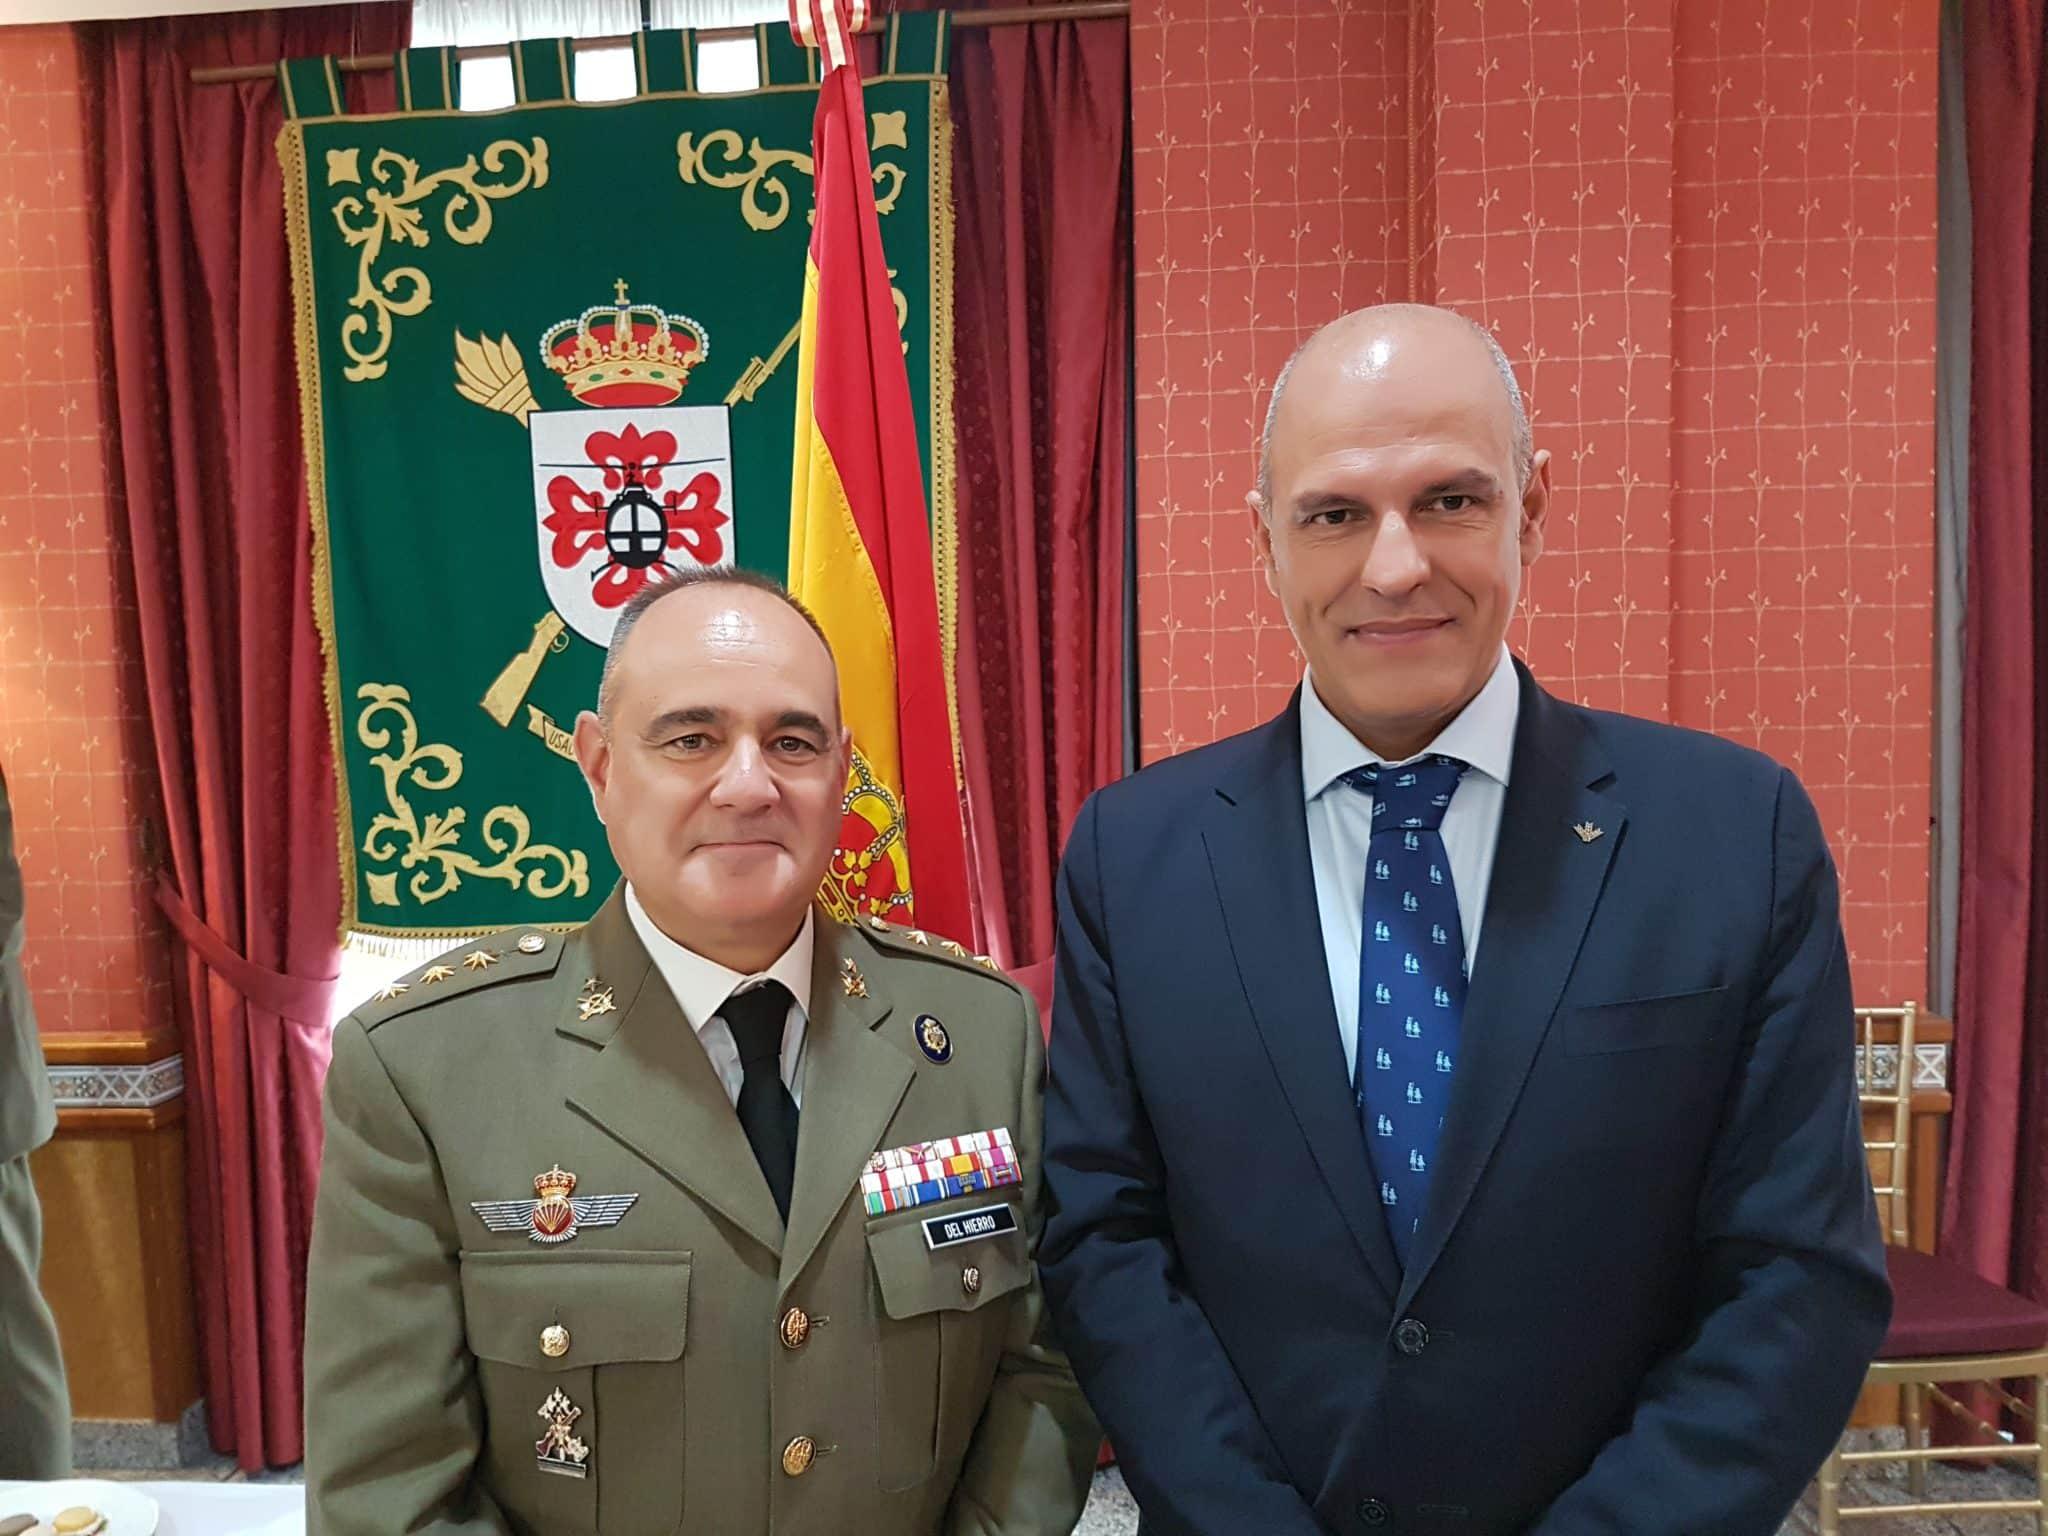 https://blog.globalcaja.es/wp-content/uploads/2017/10/Globalcaja-subdelegado-defensa.jpg